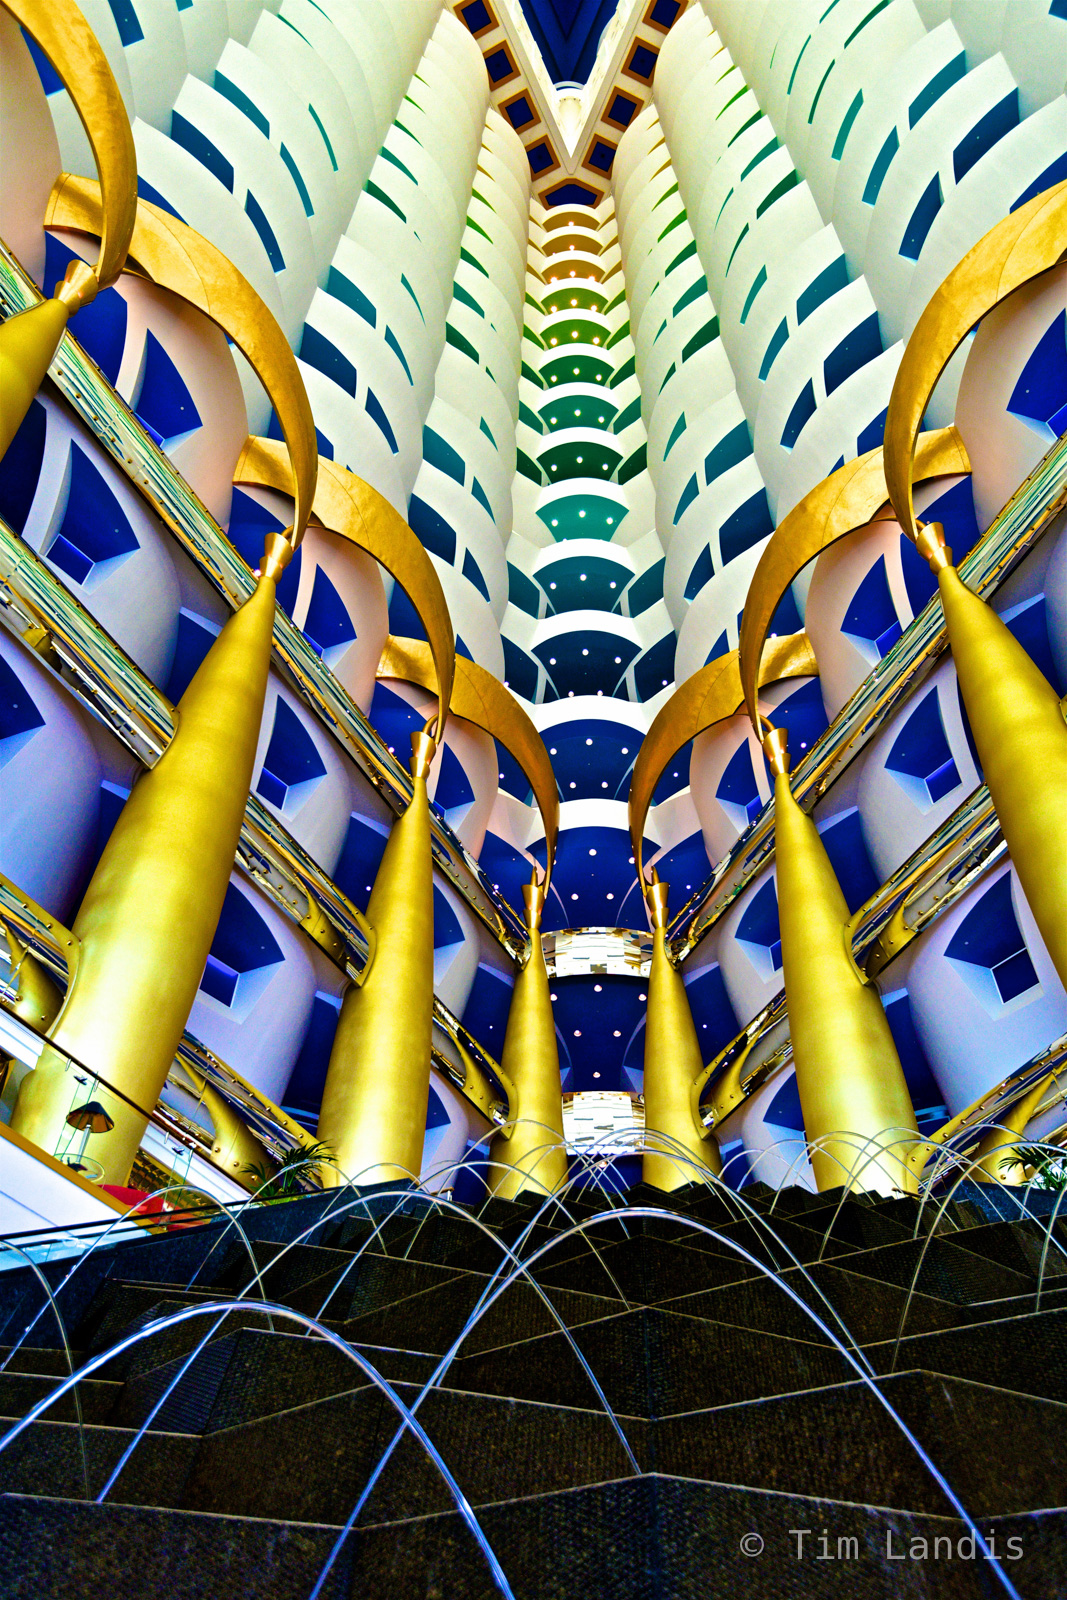 Dubai, lobby of the 7 star hotel, photo